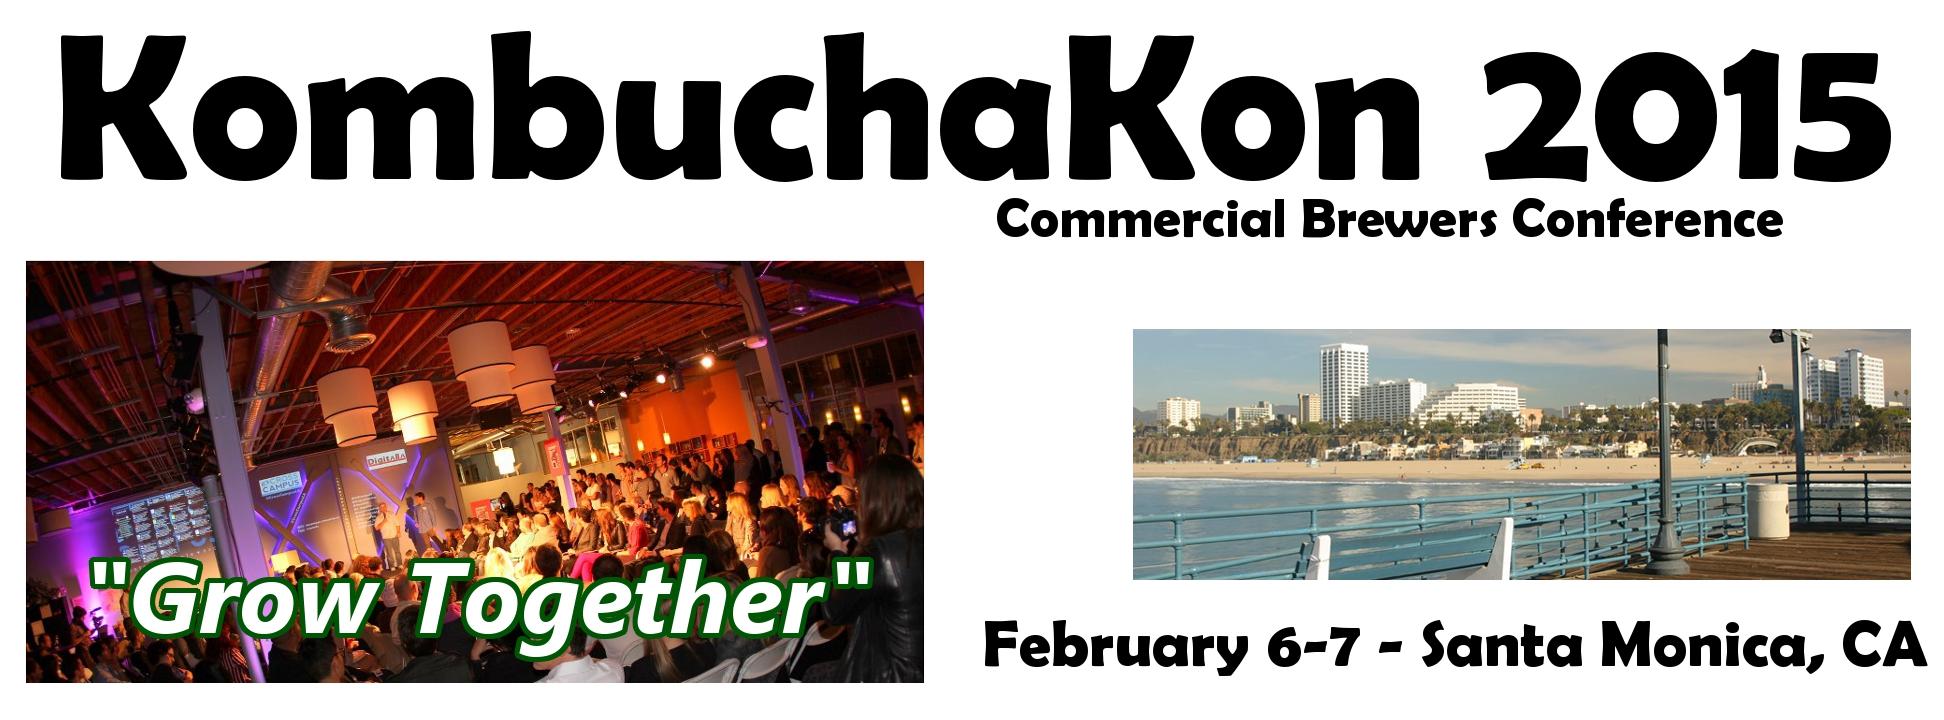 KombuchaKon-banner-2015